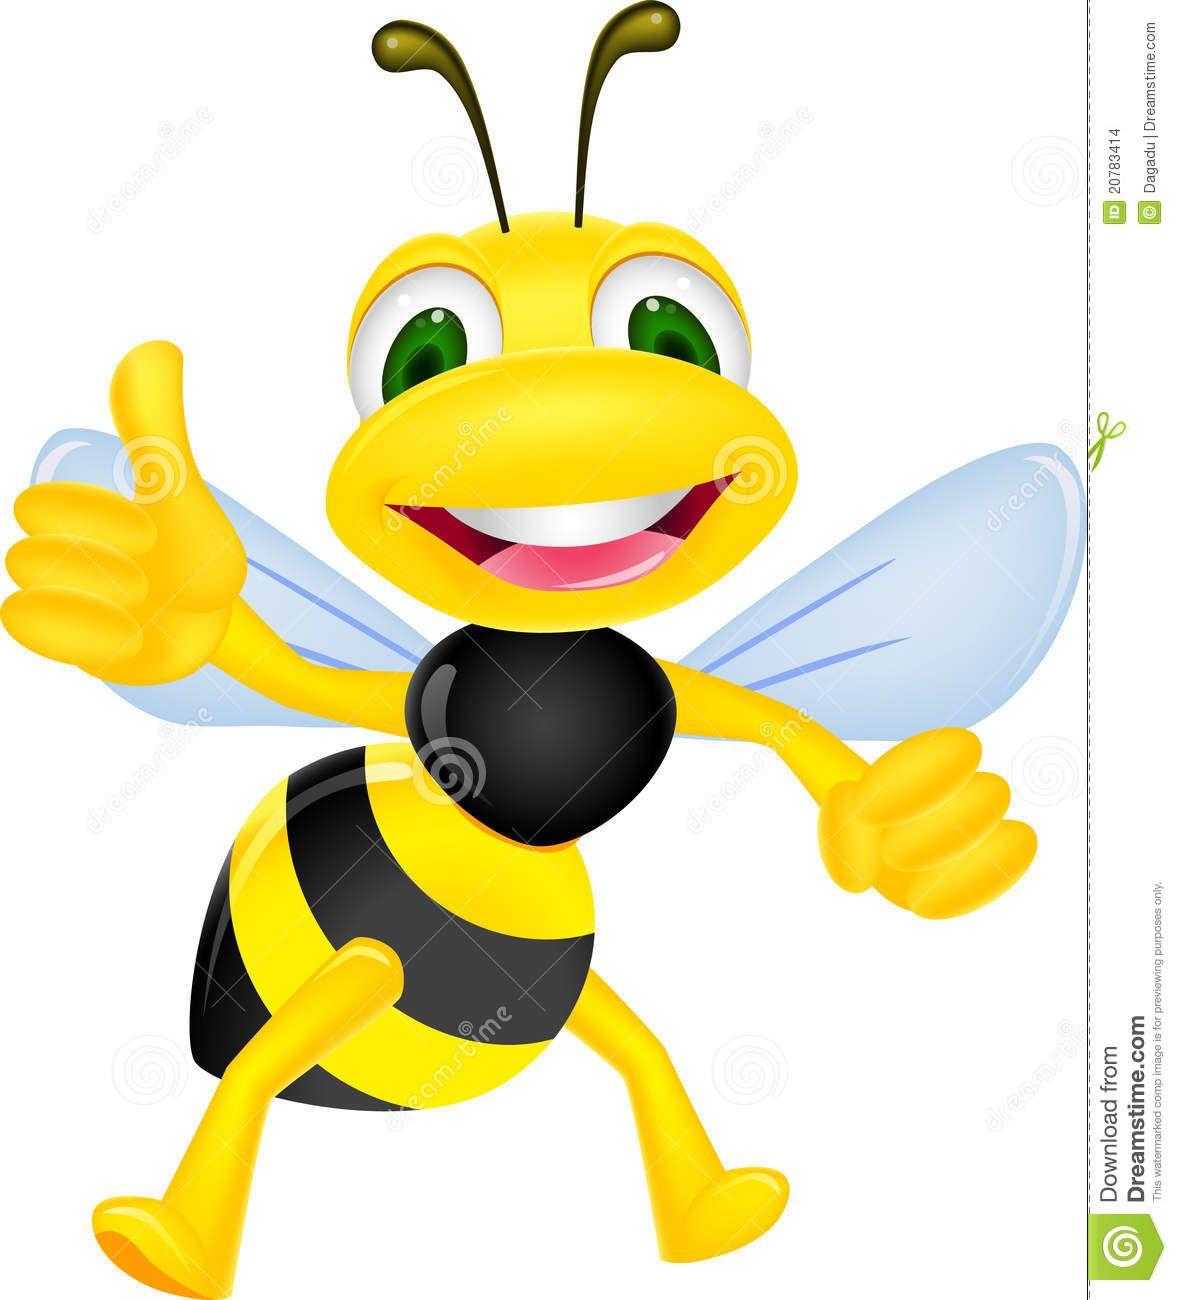 abejas animadas estudiando - Buscar con Google | arte infantil ...